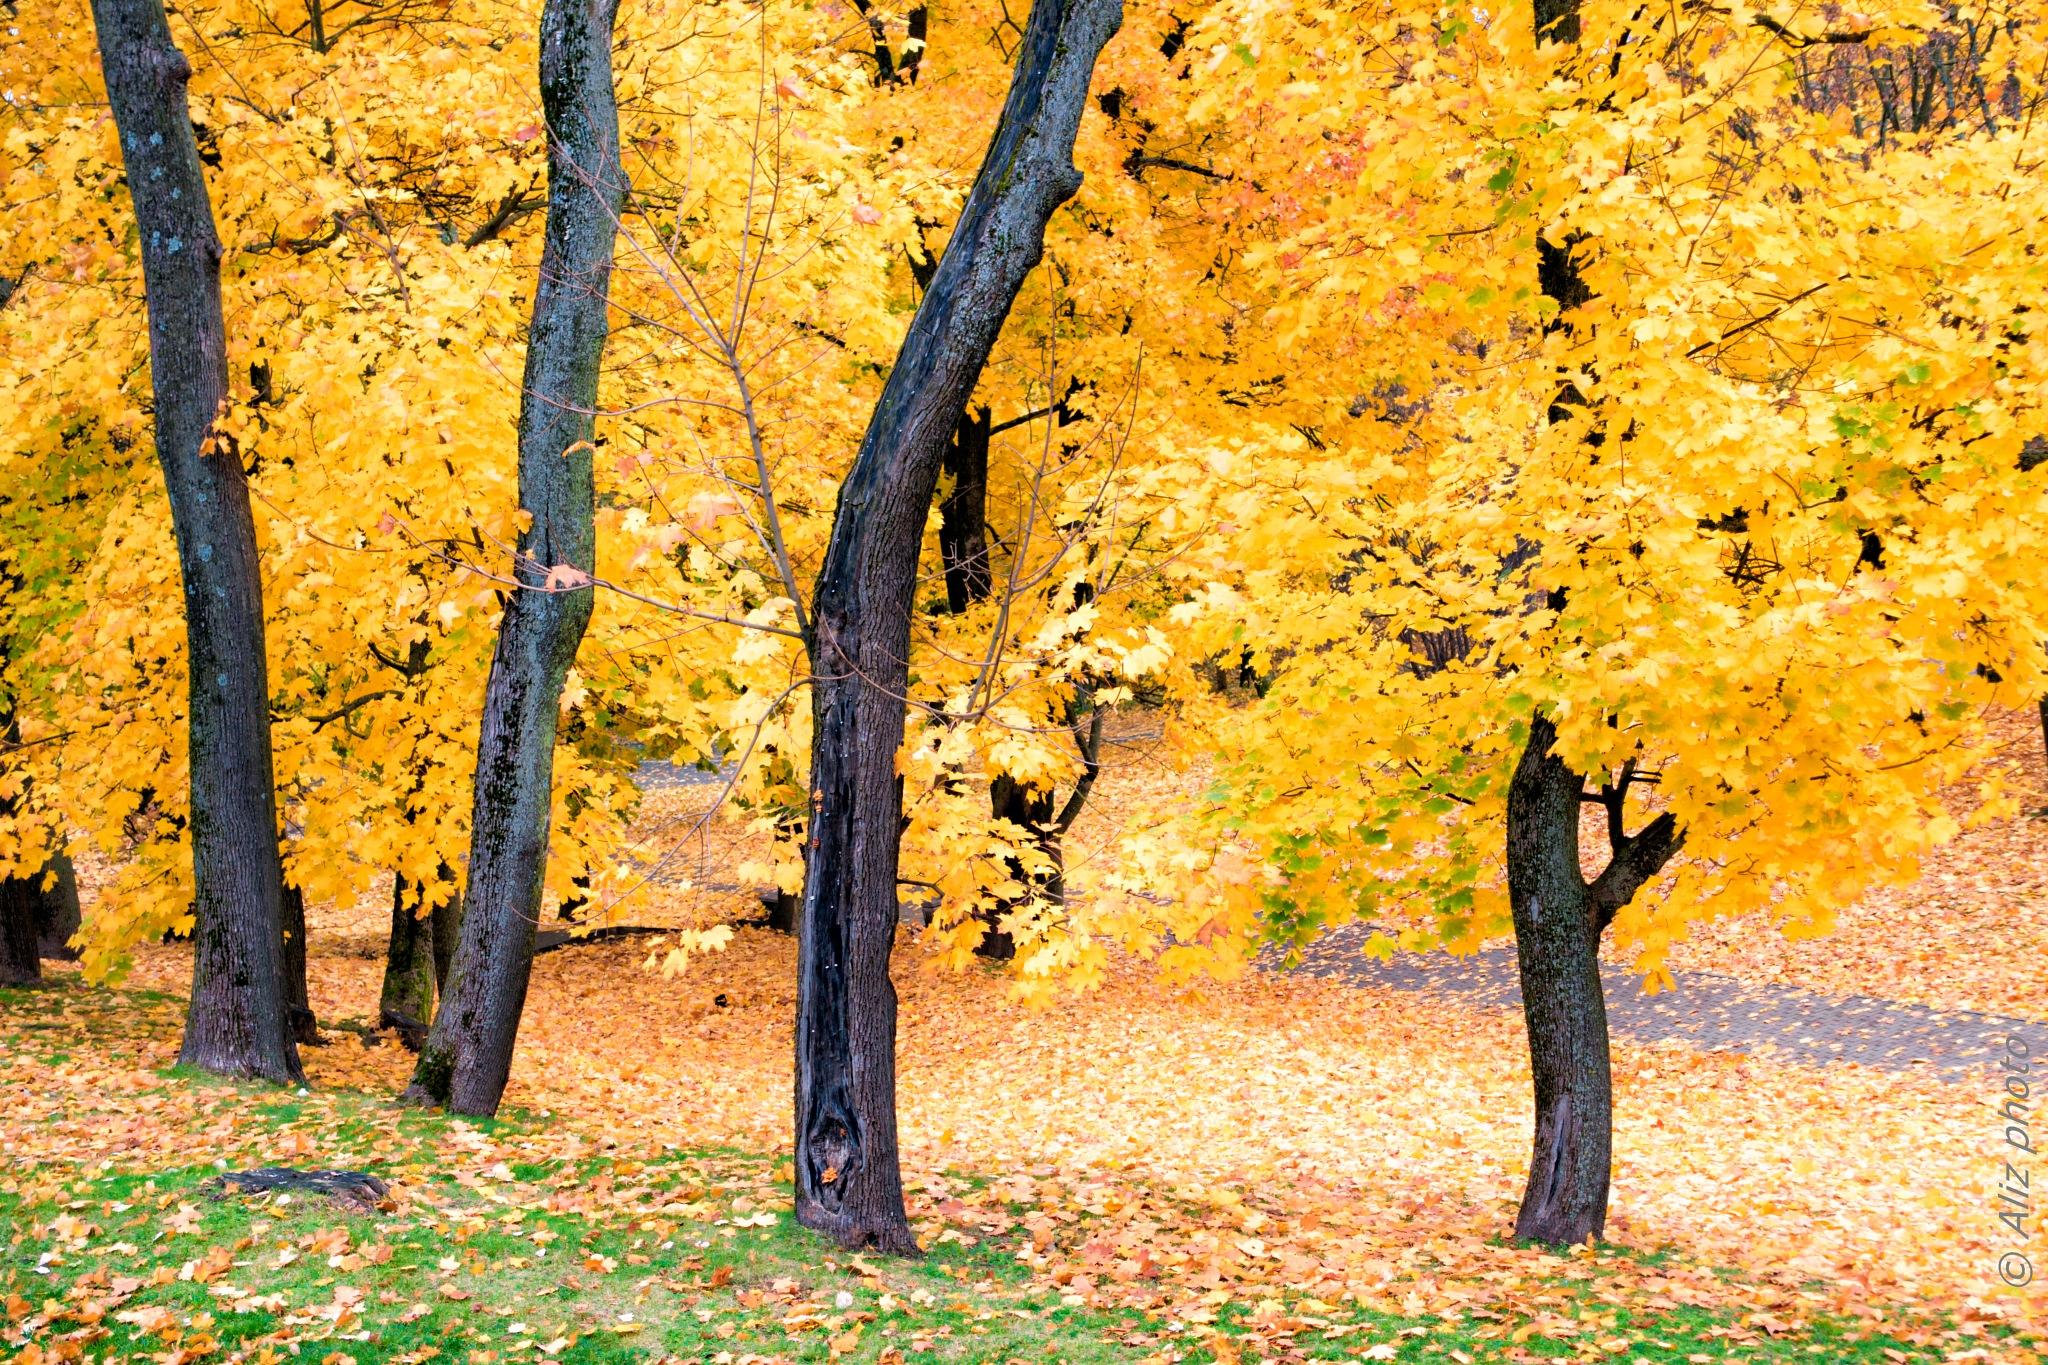 Autumn 2017 by Aleksandras Zvirzdinas